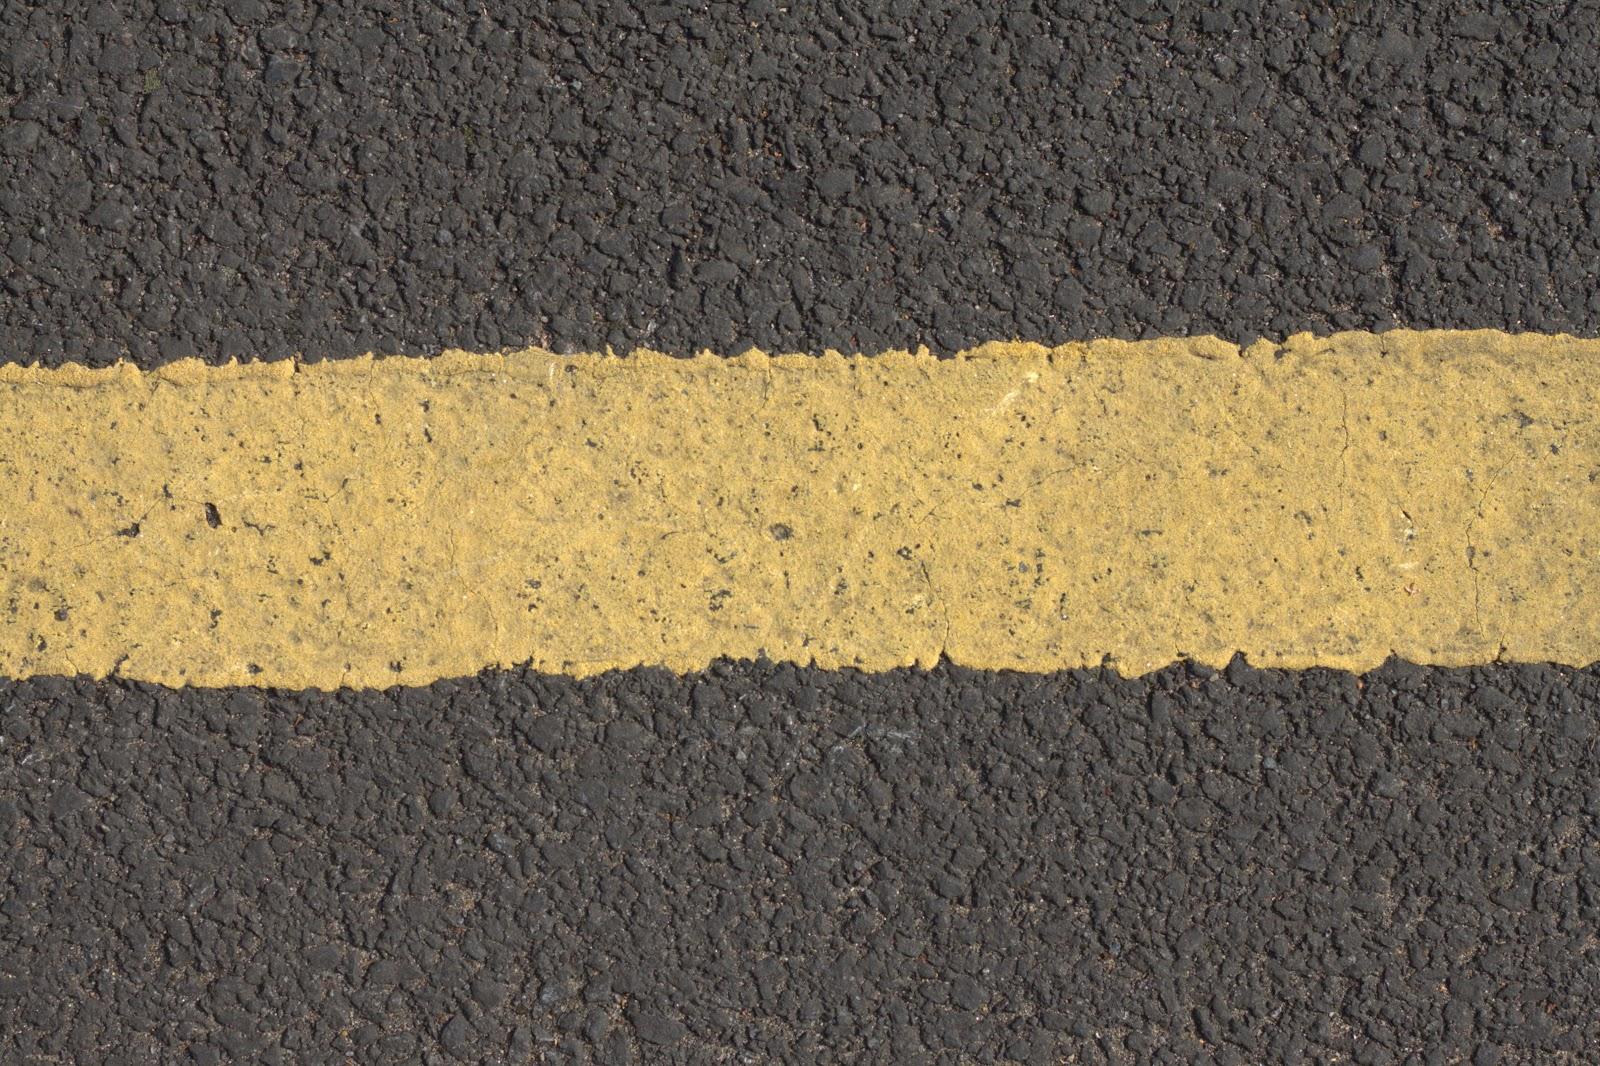 (ASPHALT 3) tarmac yellow road tar texture 4770x3178